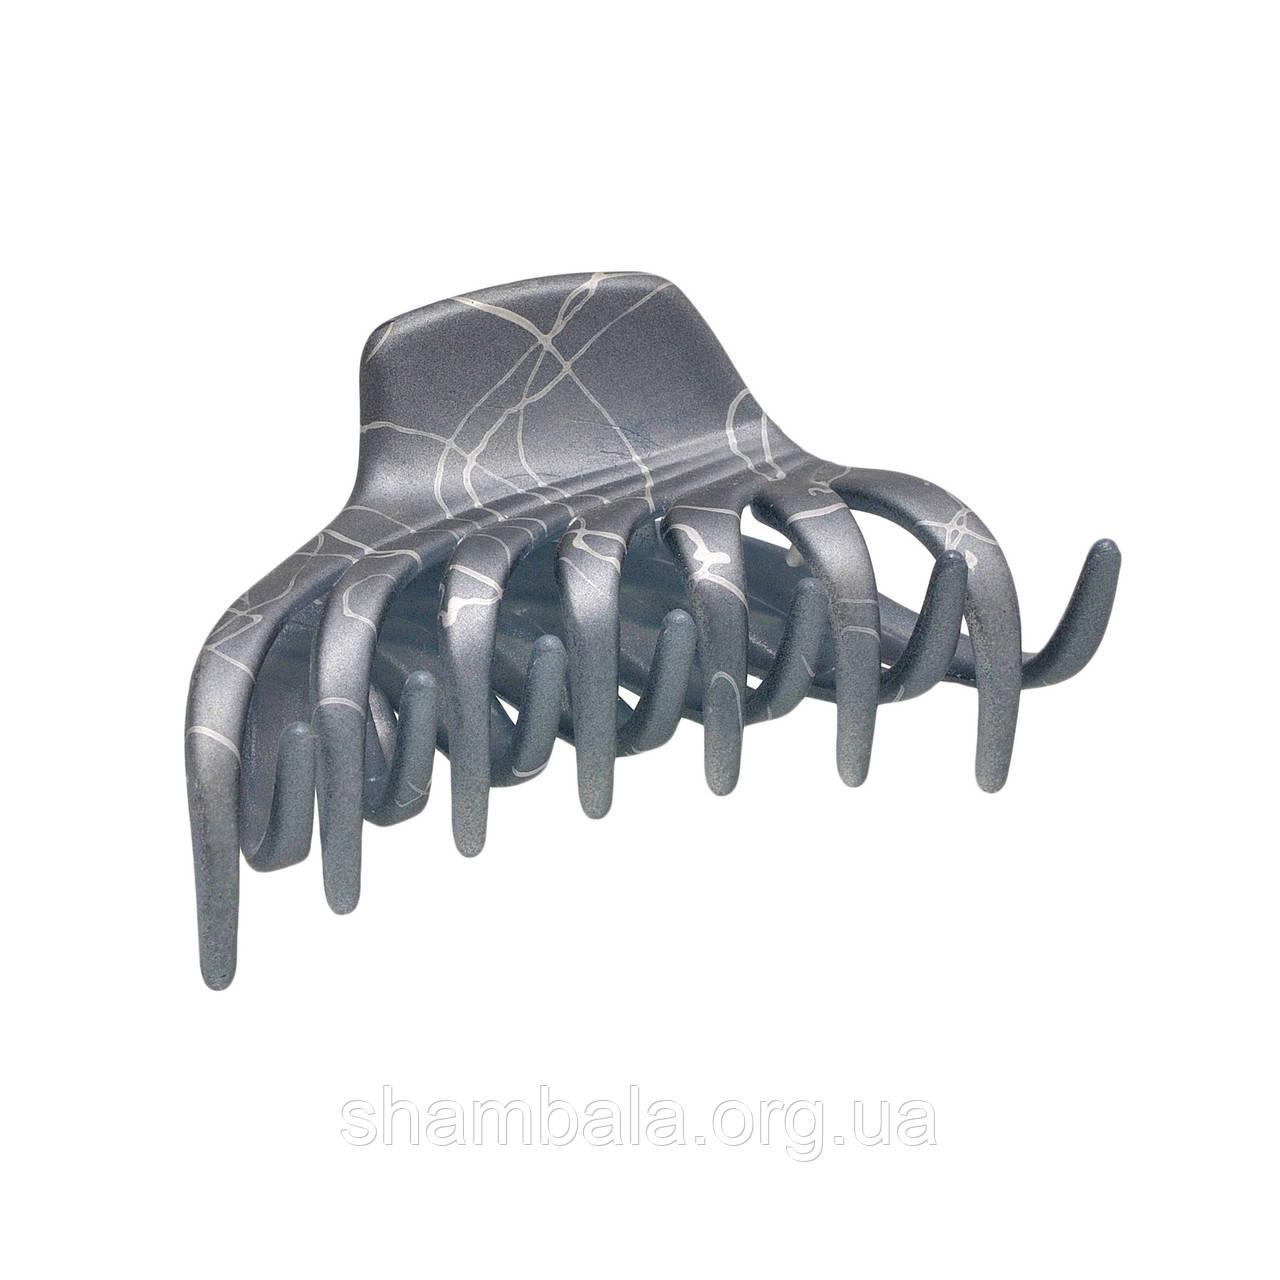 "Заколка-краб для волосся ""Matte Ornament"" (041599)"